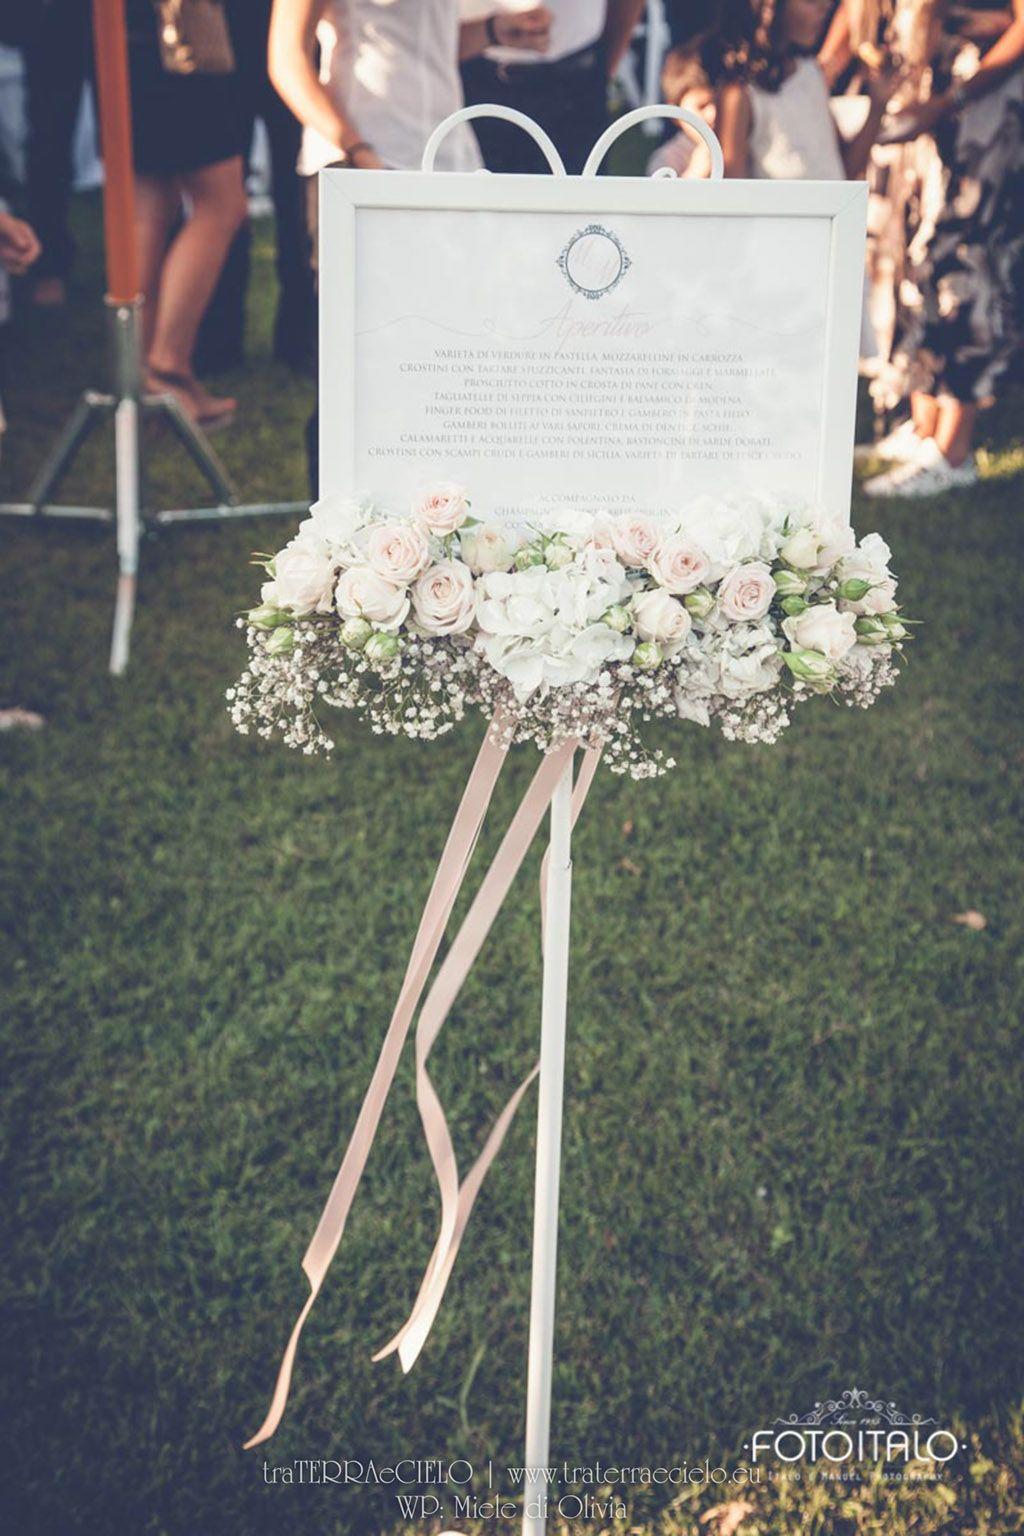 Matrimonio In Bianco : Matrimonio sposa sposo portafedi tableau de mariage rosa